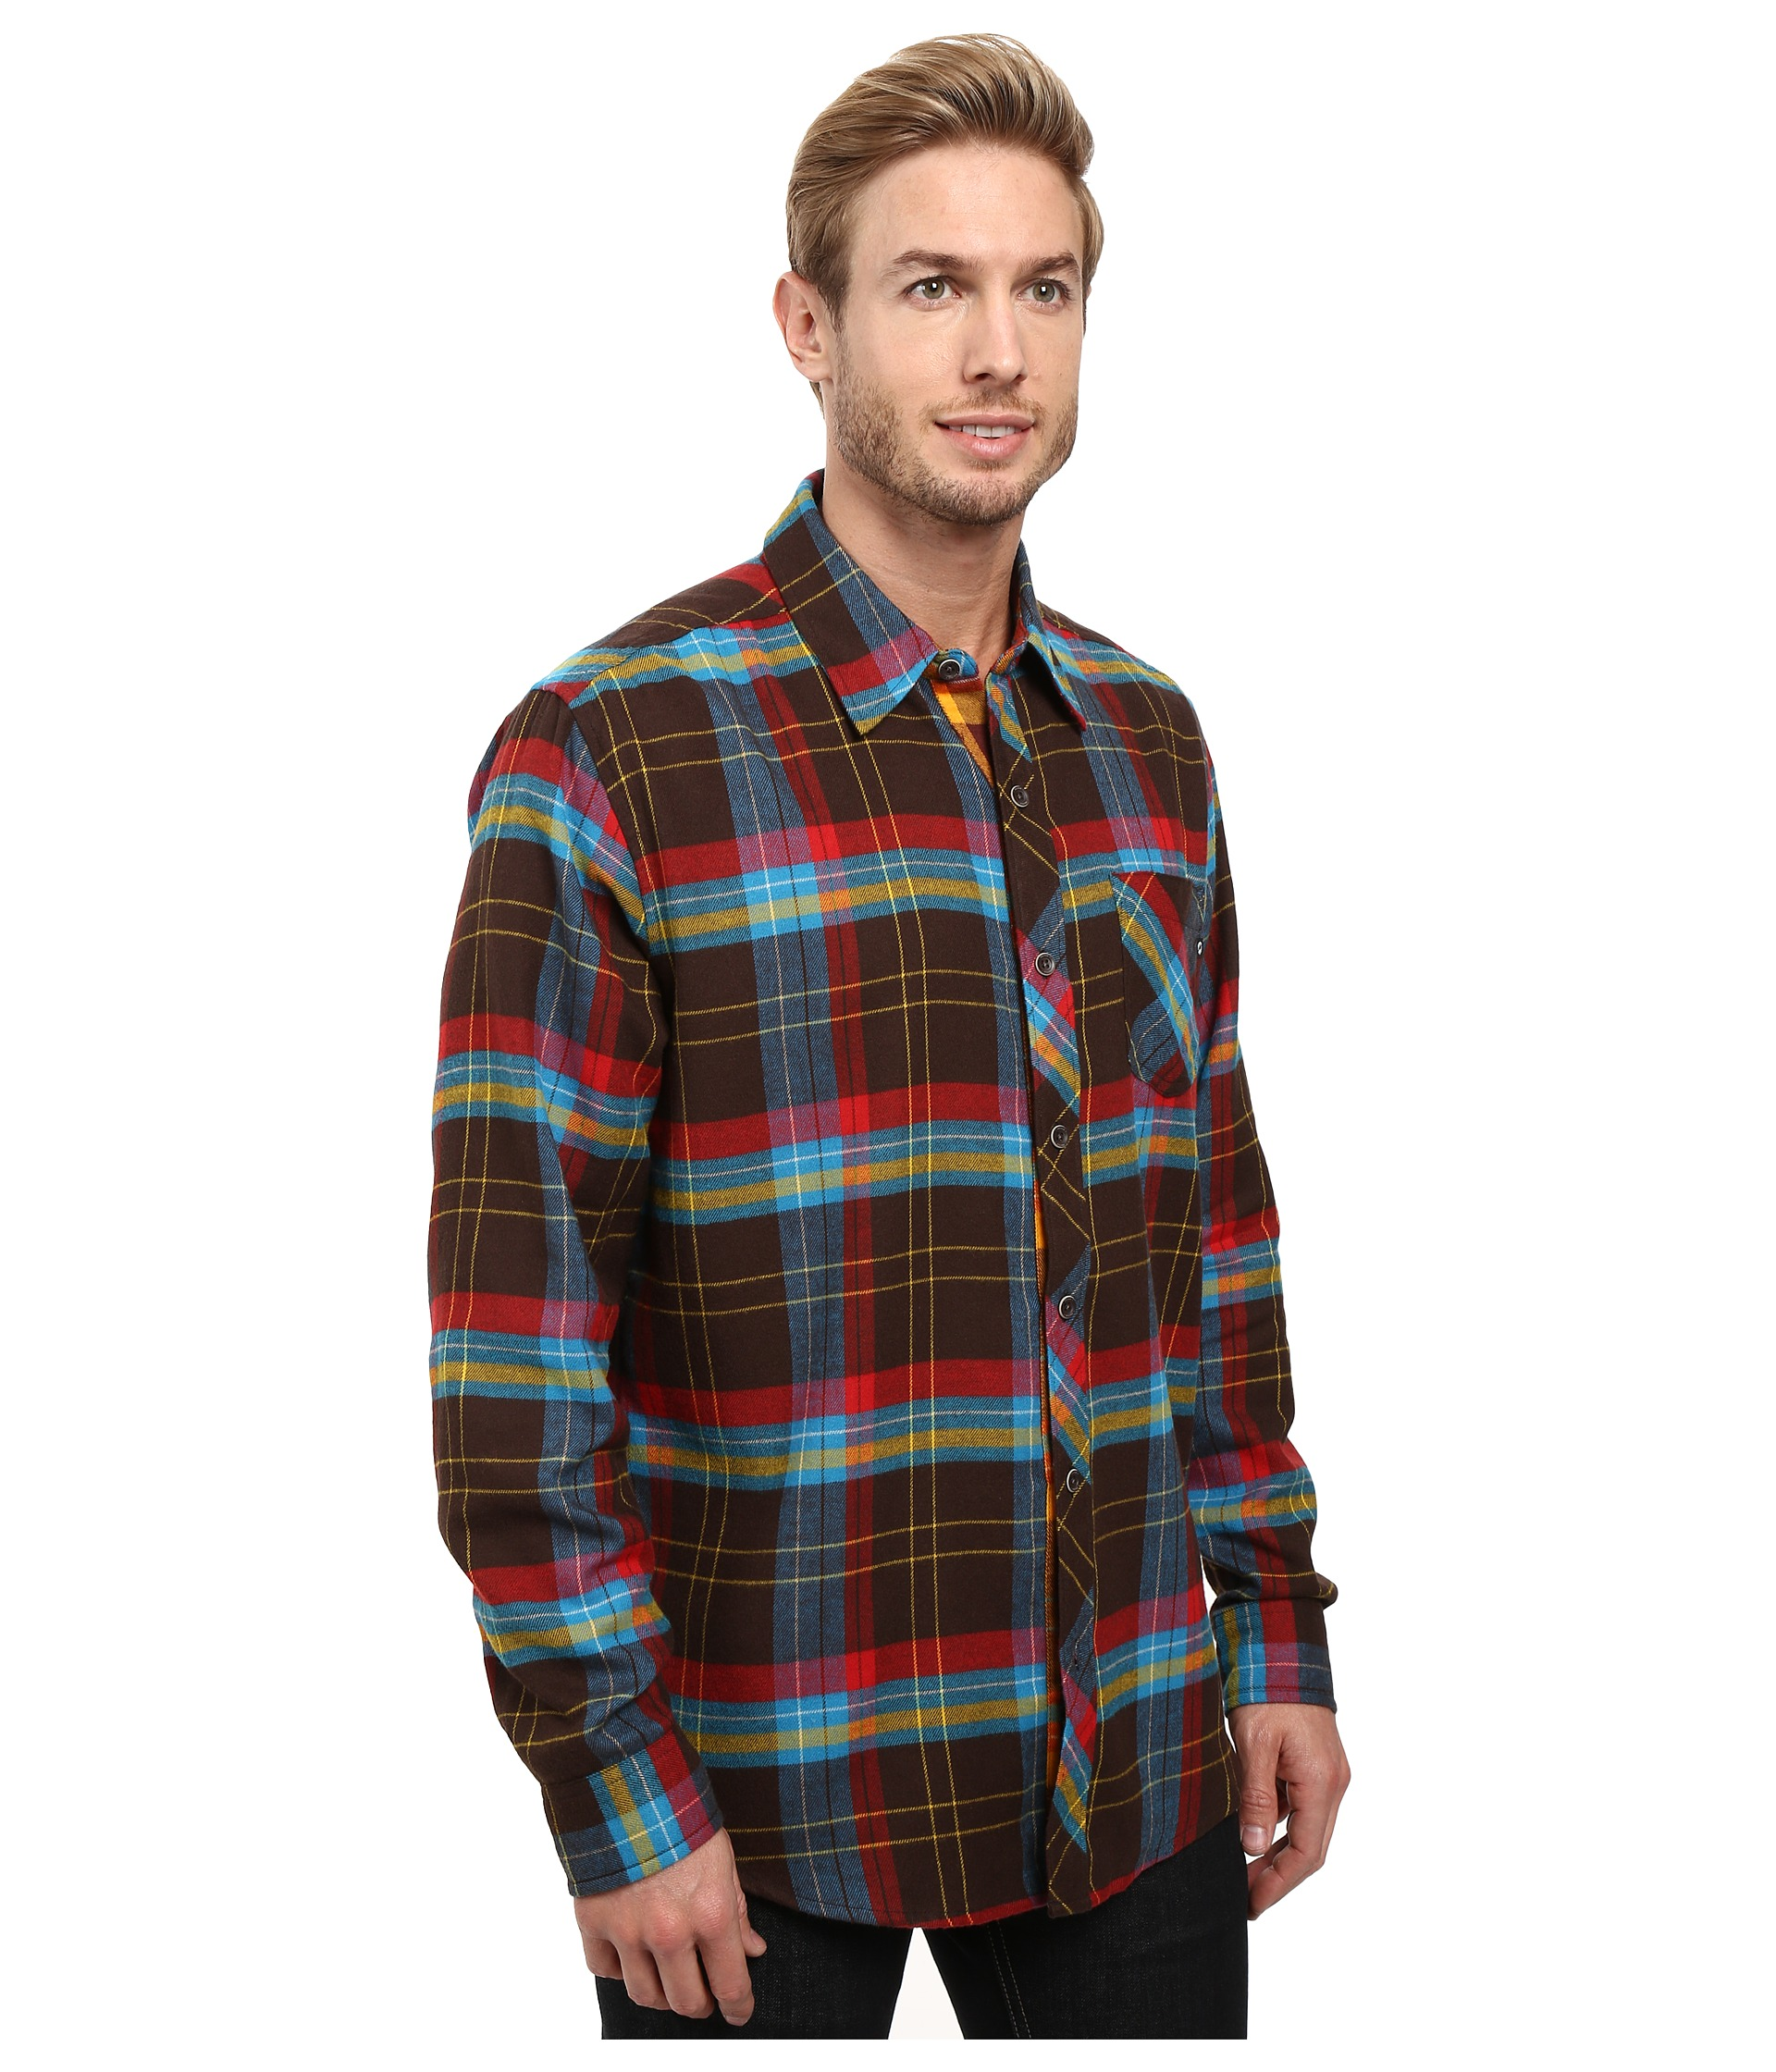 Marmot anderson flannel long sleeve shirt rich brown for Marmot anderson flannel shirt men s